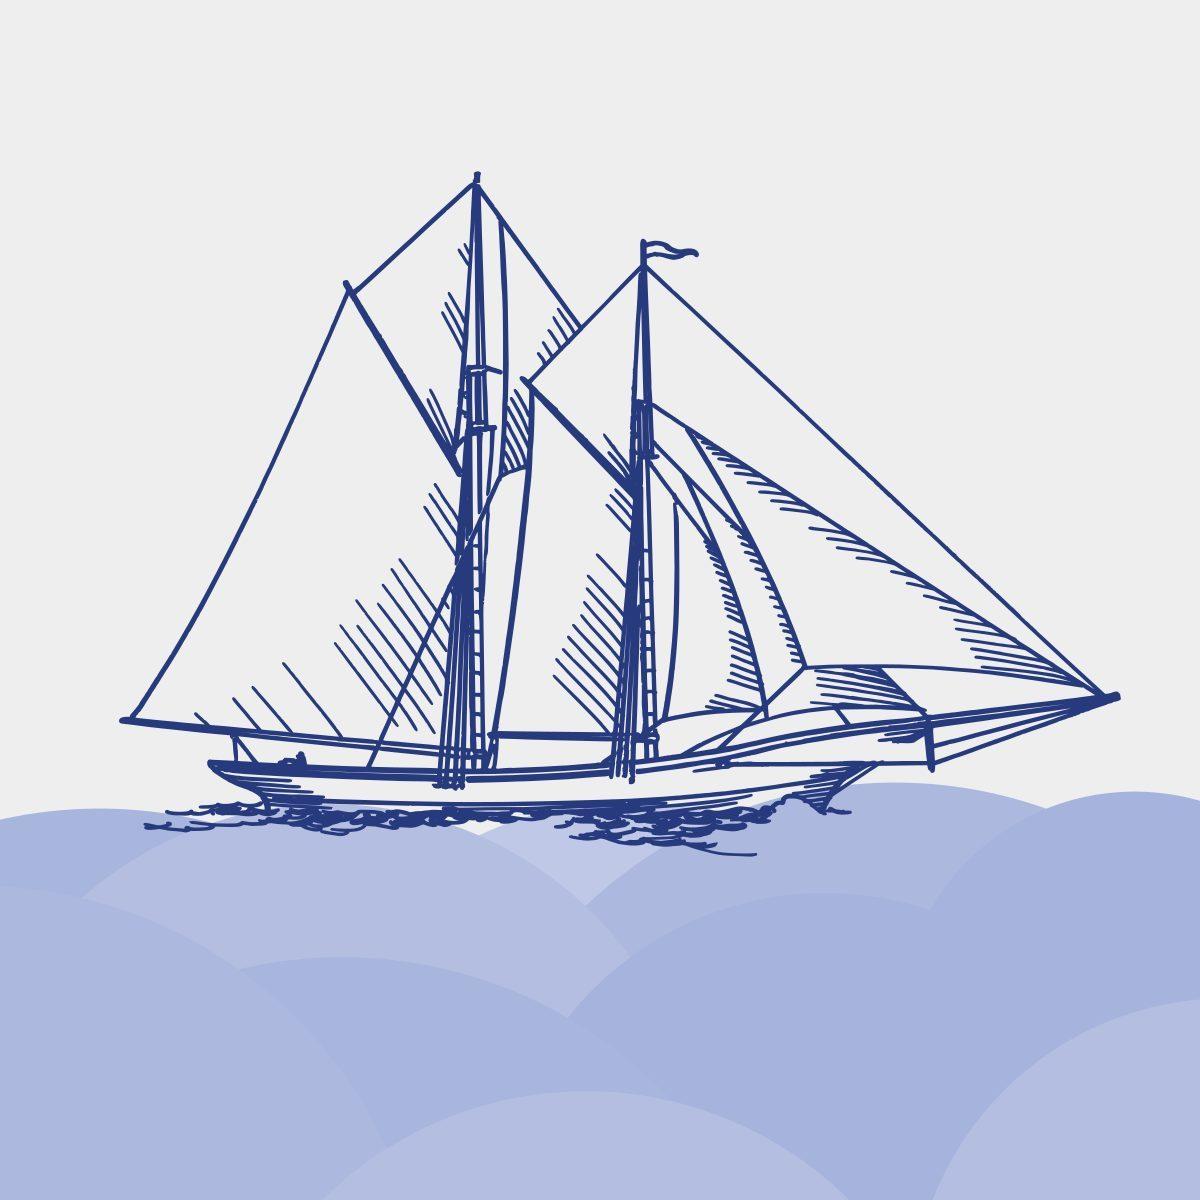 Boat illustration 1